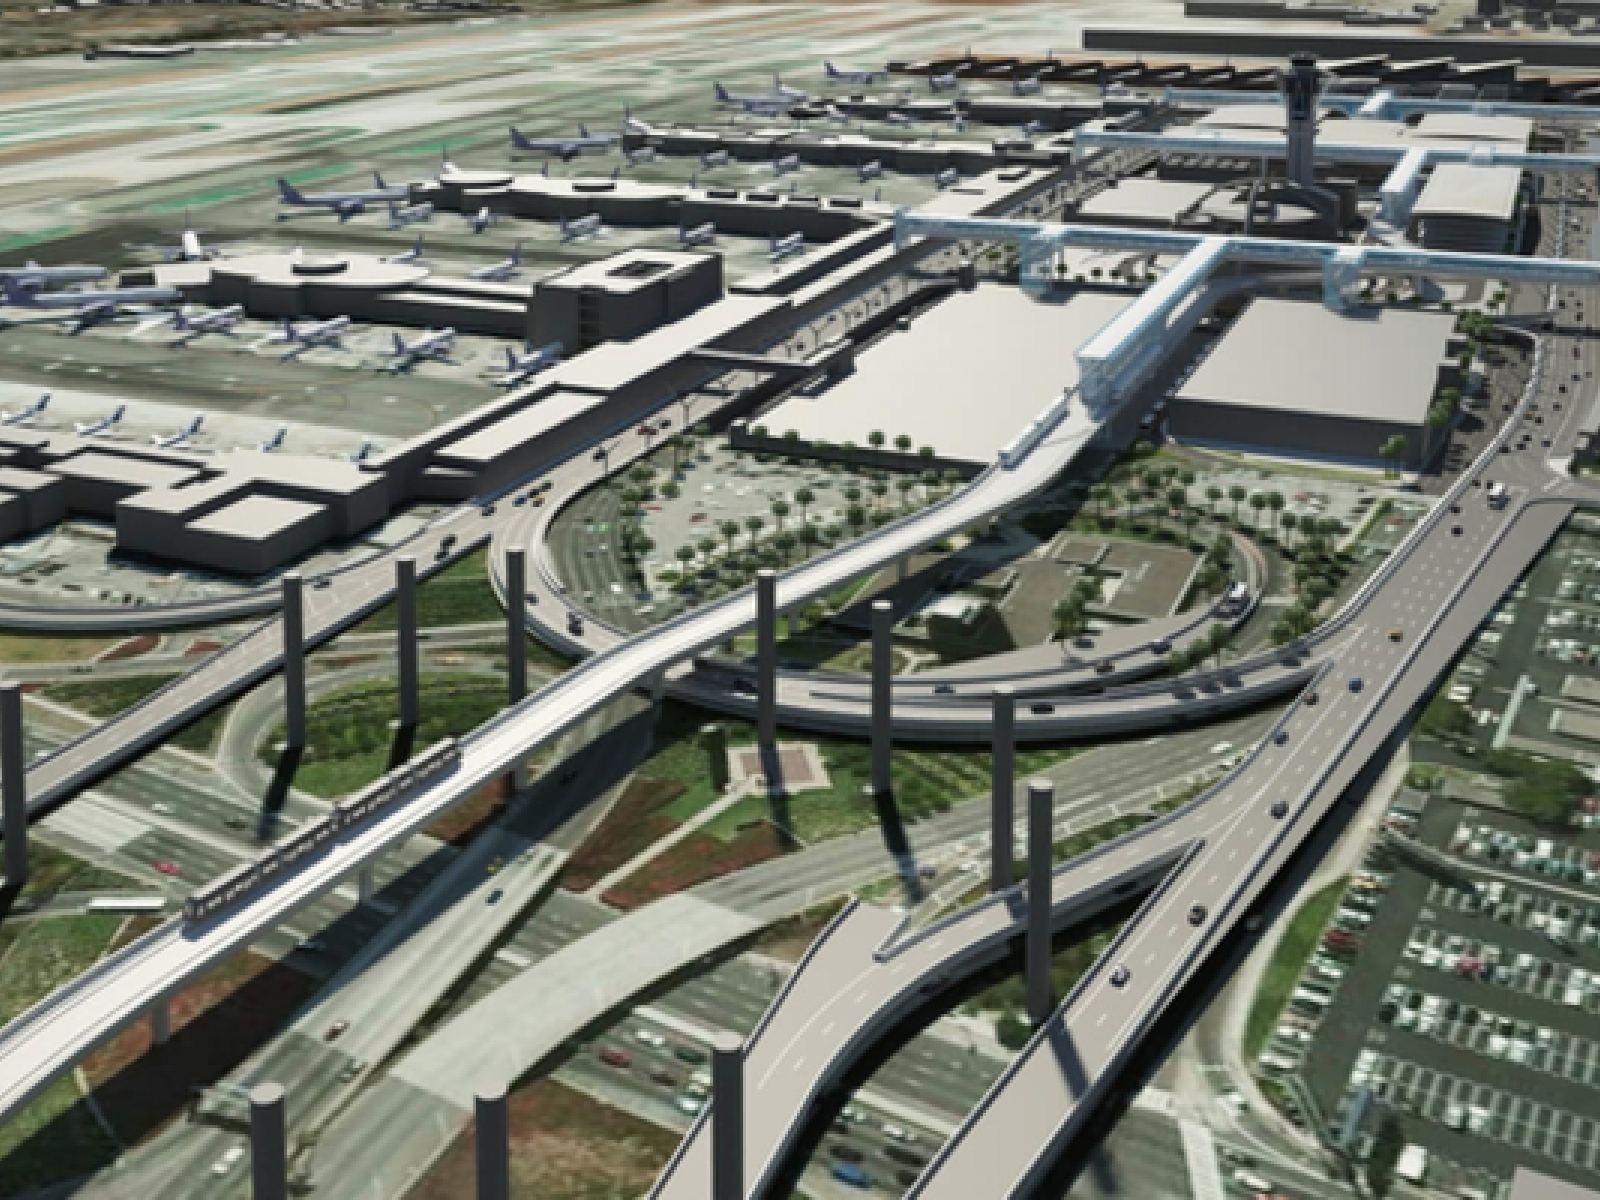 Main image for article titled Conheça o Futuro do Aeroporto Internacional de Los Angeles (LAX)